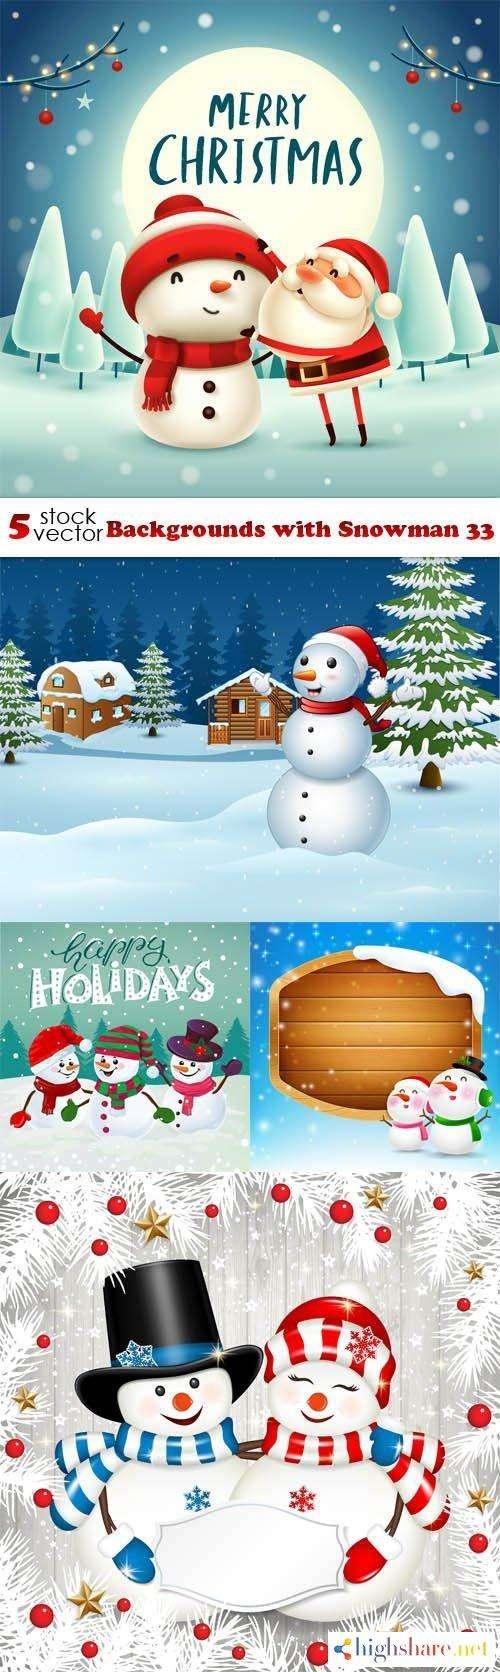 vectors backgrounds with snowman 33 5f439dcc38b08 - Vectors - Backgrounds with Snowman 33